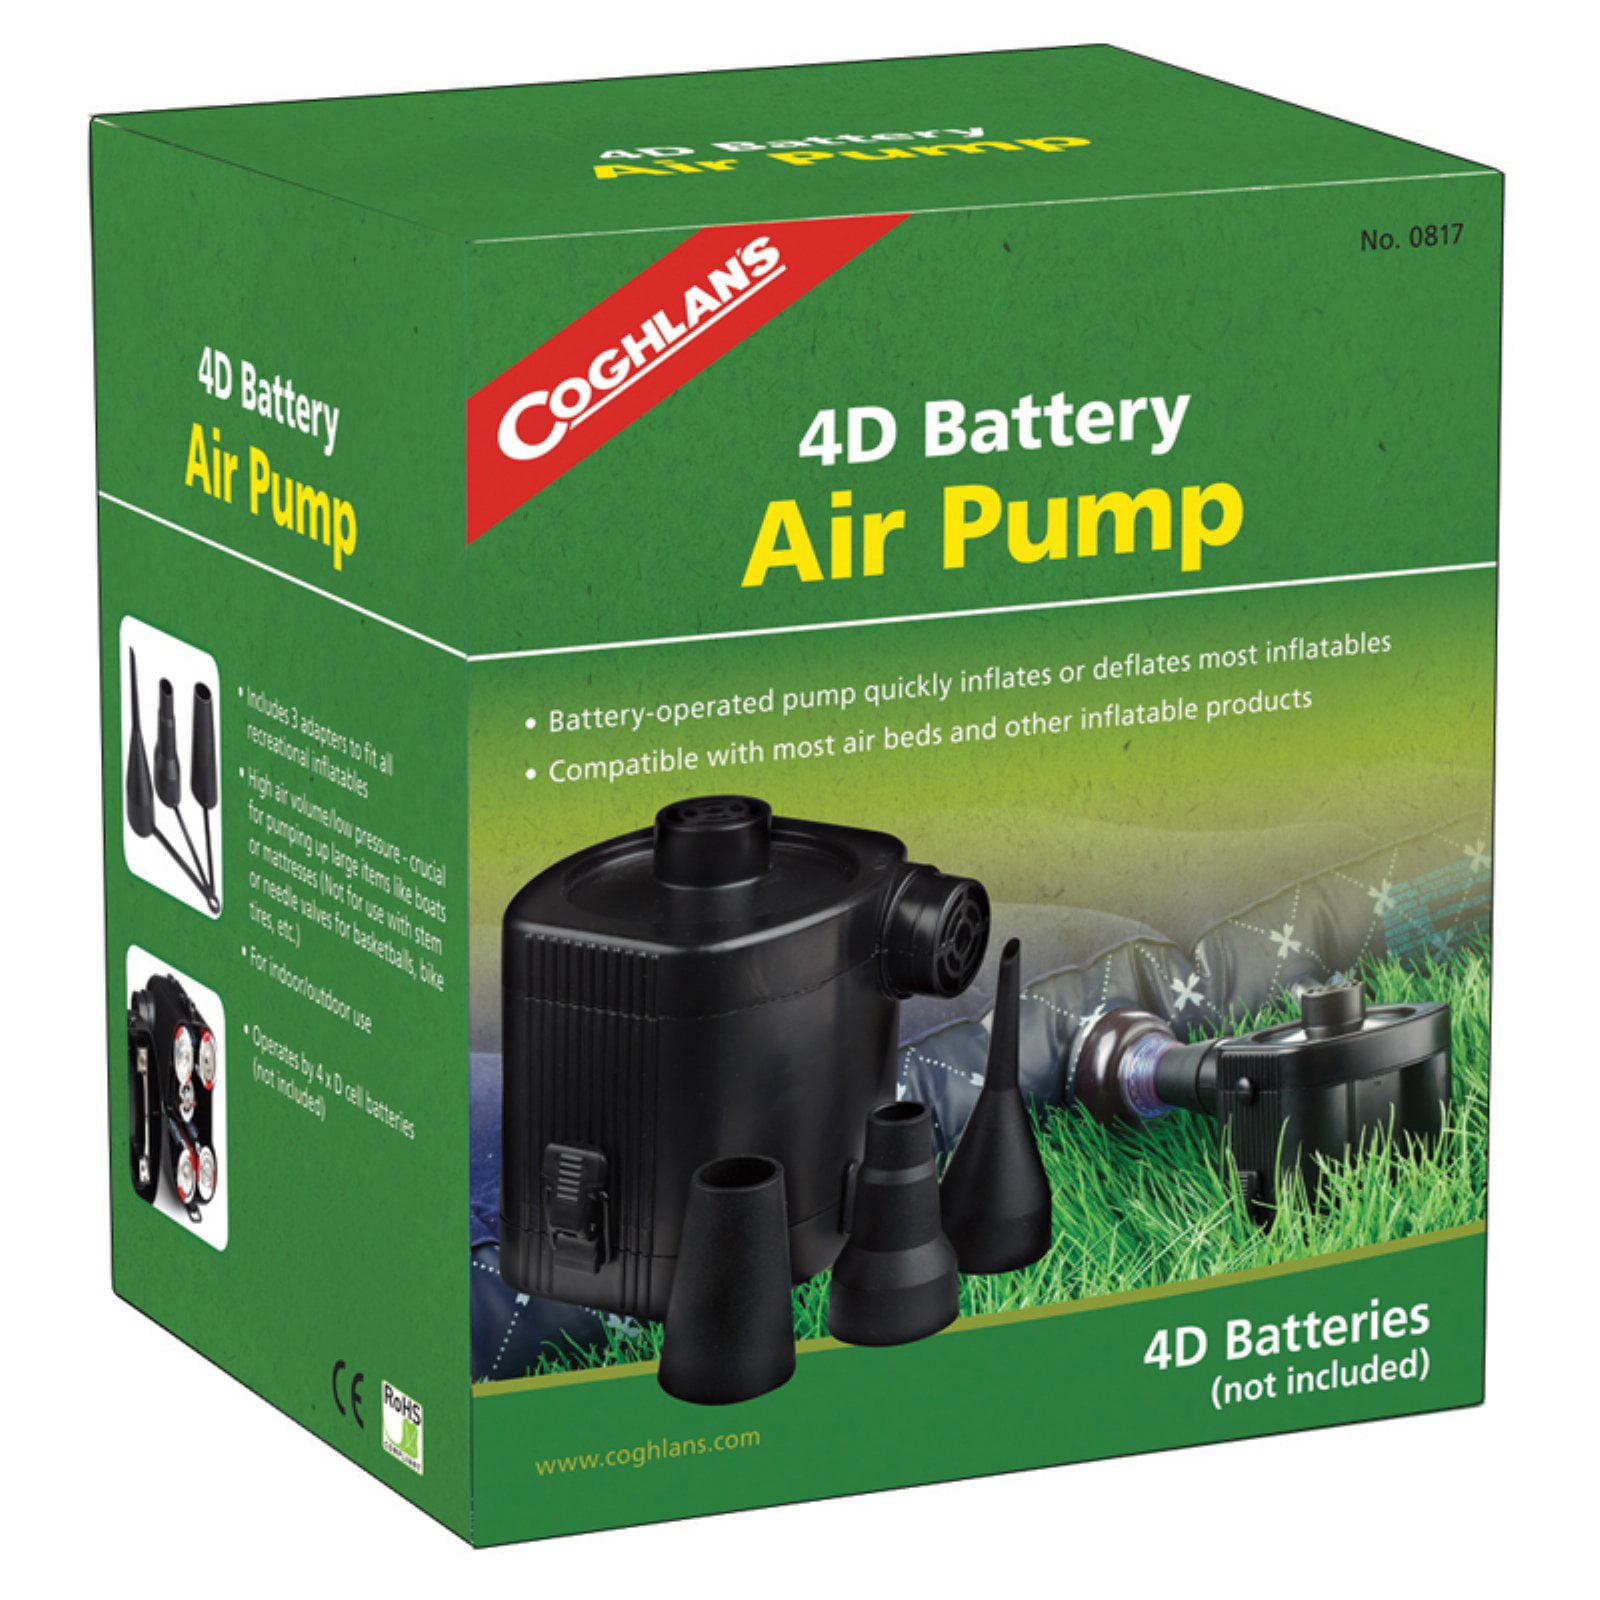 Coghlans 0817 Coghlan's Battery Powered Air Pump